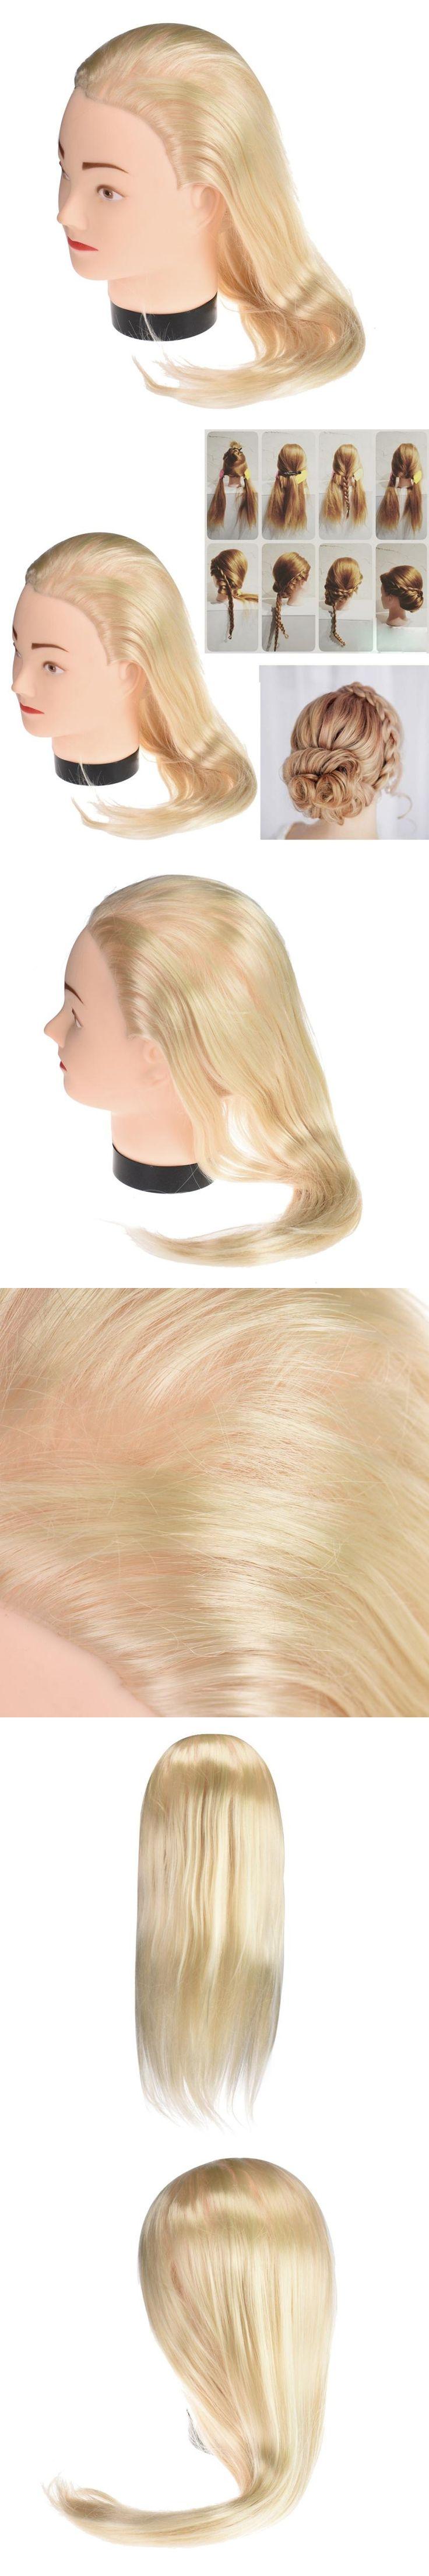 New Female Dummy Head Long Hair Hairdressing Training Head Model Oct 28